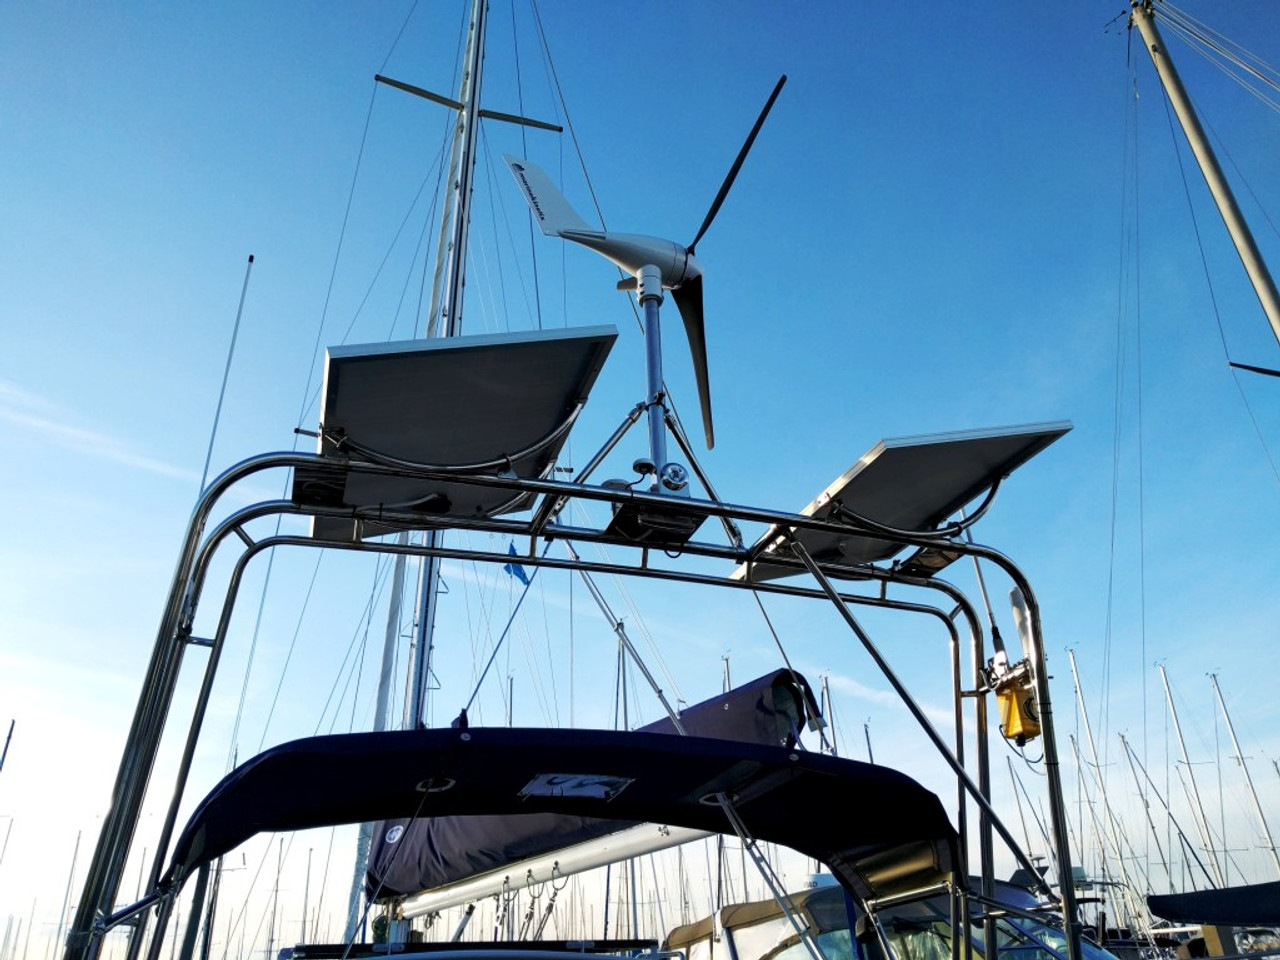 Arch Mounted MK4+ Marine Kinetix Wind Generator